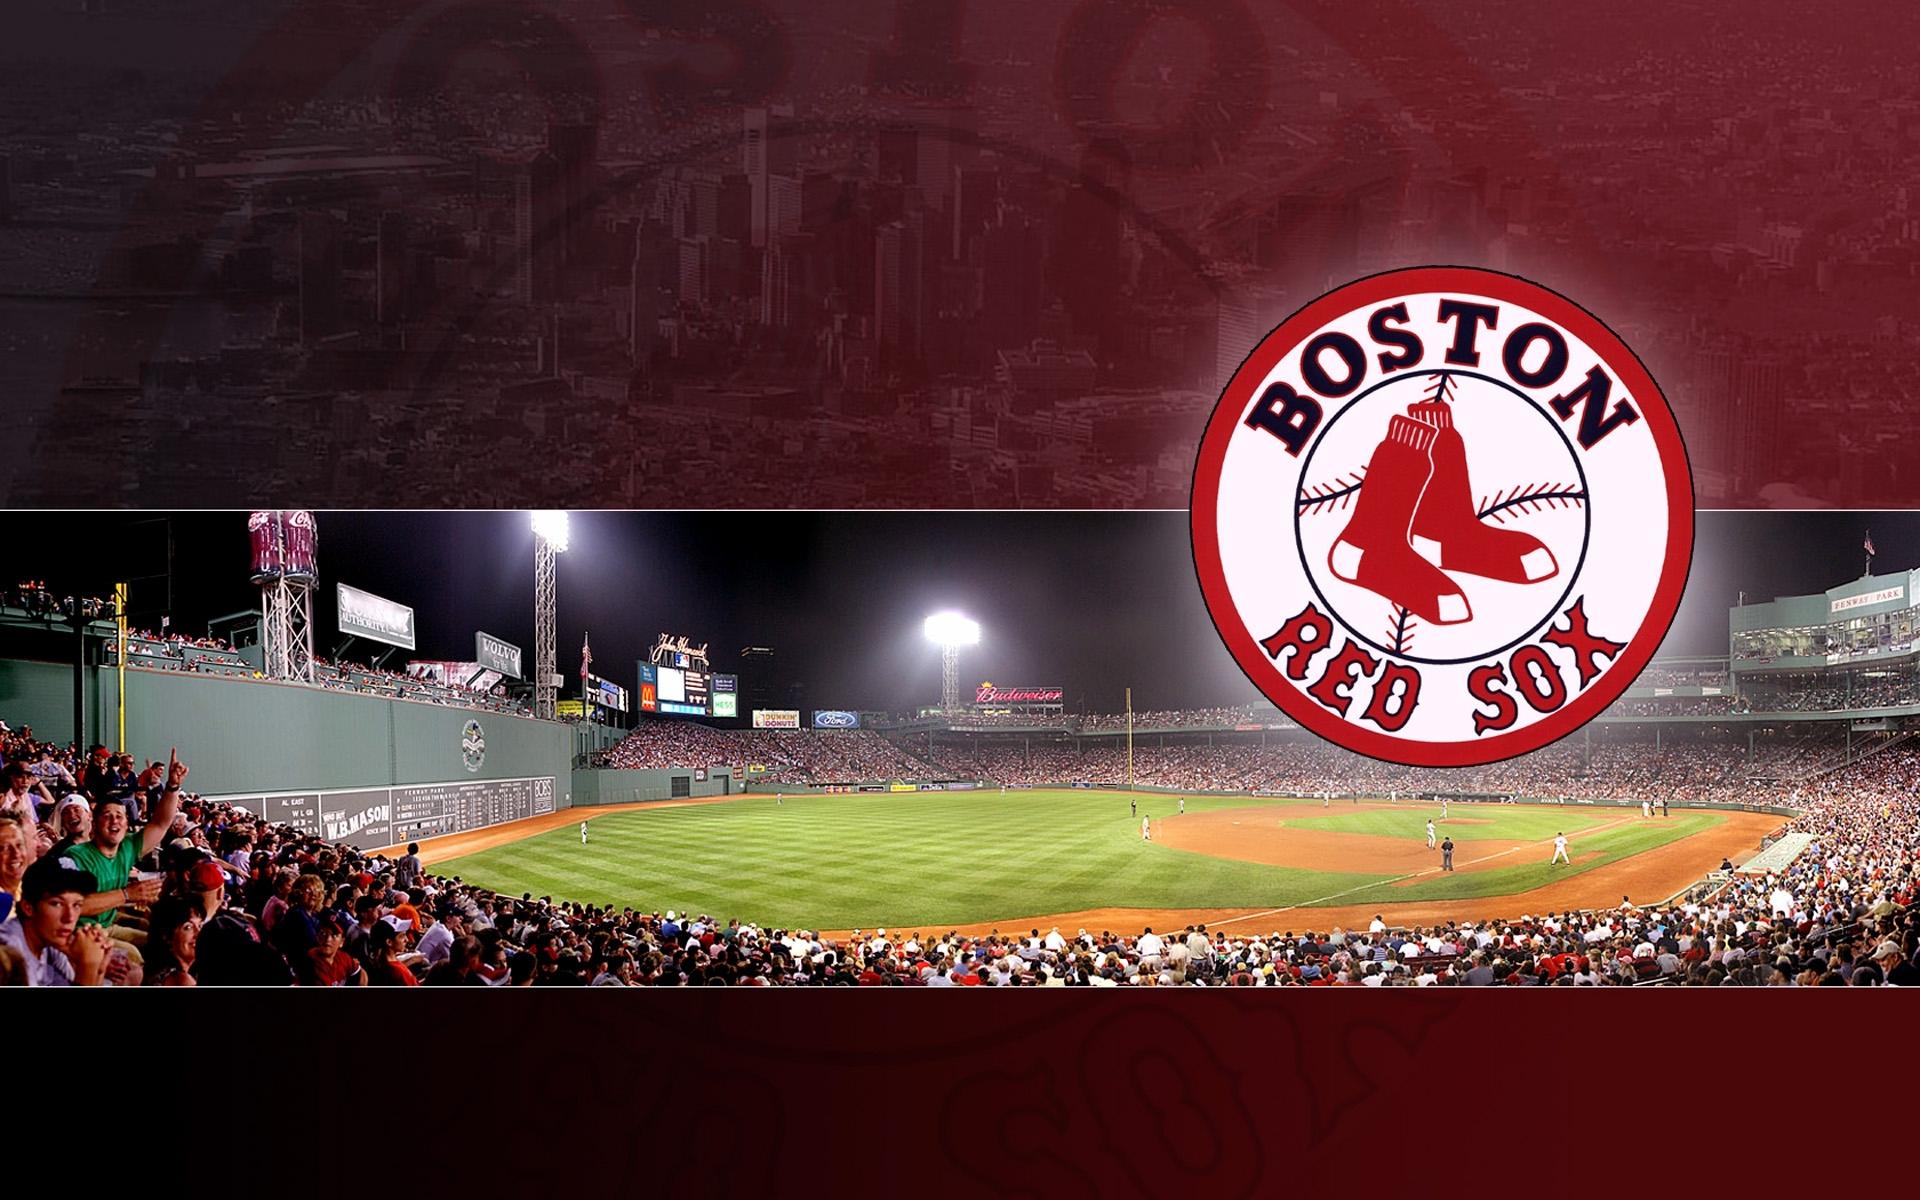 boston red sox logo pictures. - media file   pixelstalk